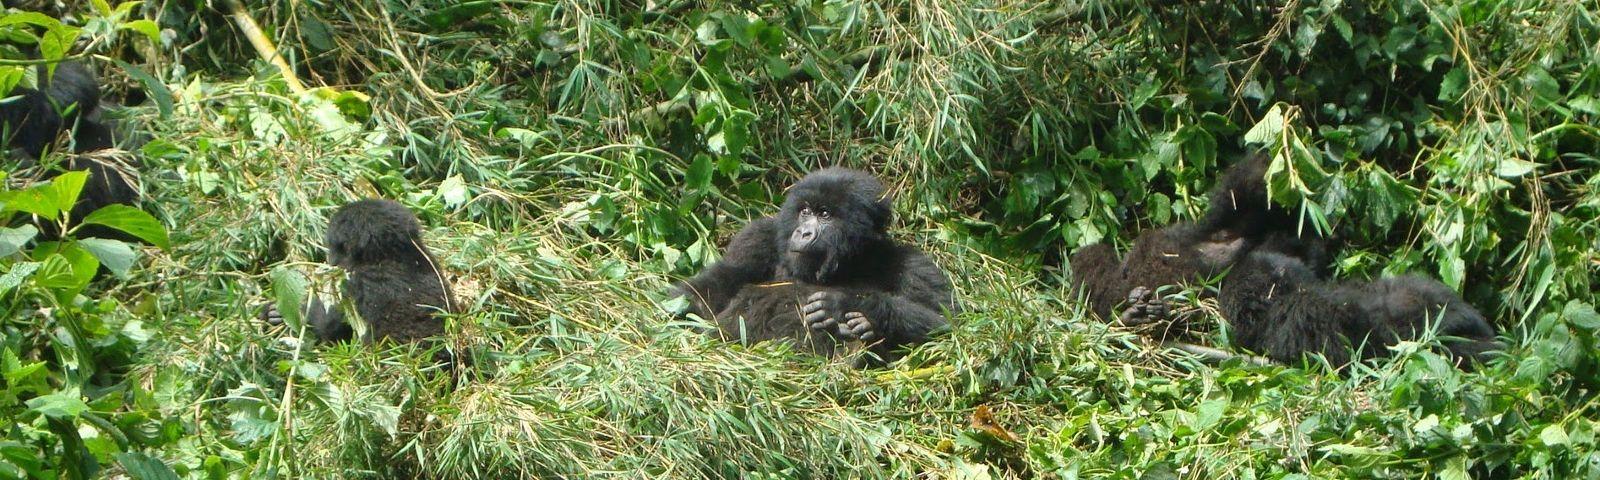 Gorillas in Ruanda - Highlights of Rwanda